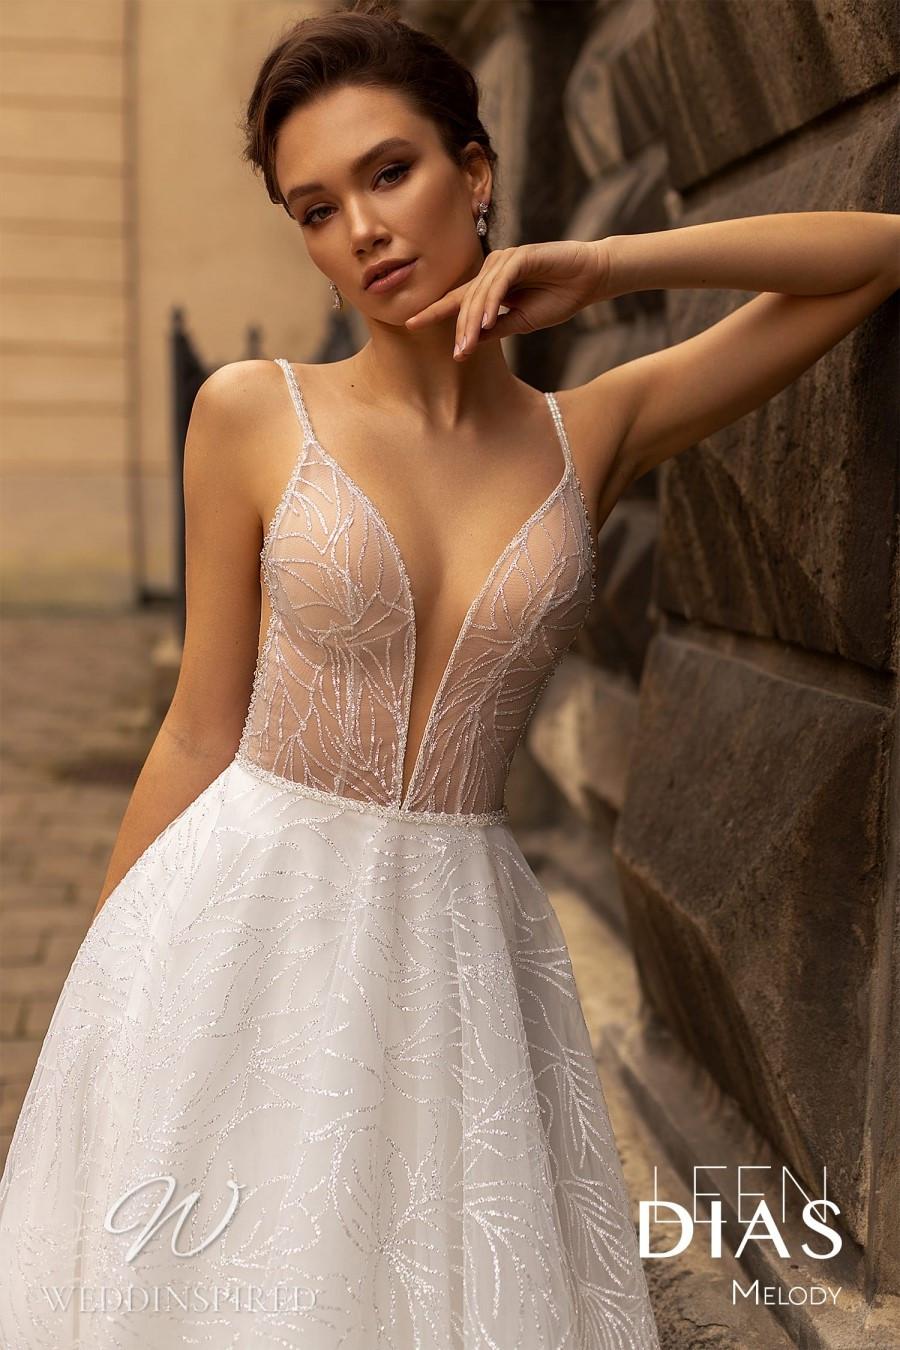 A Leen Dias 2021 tulle A-line wedding dress with a v neck